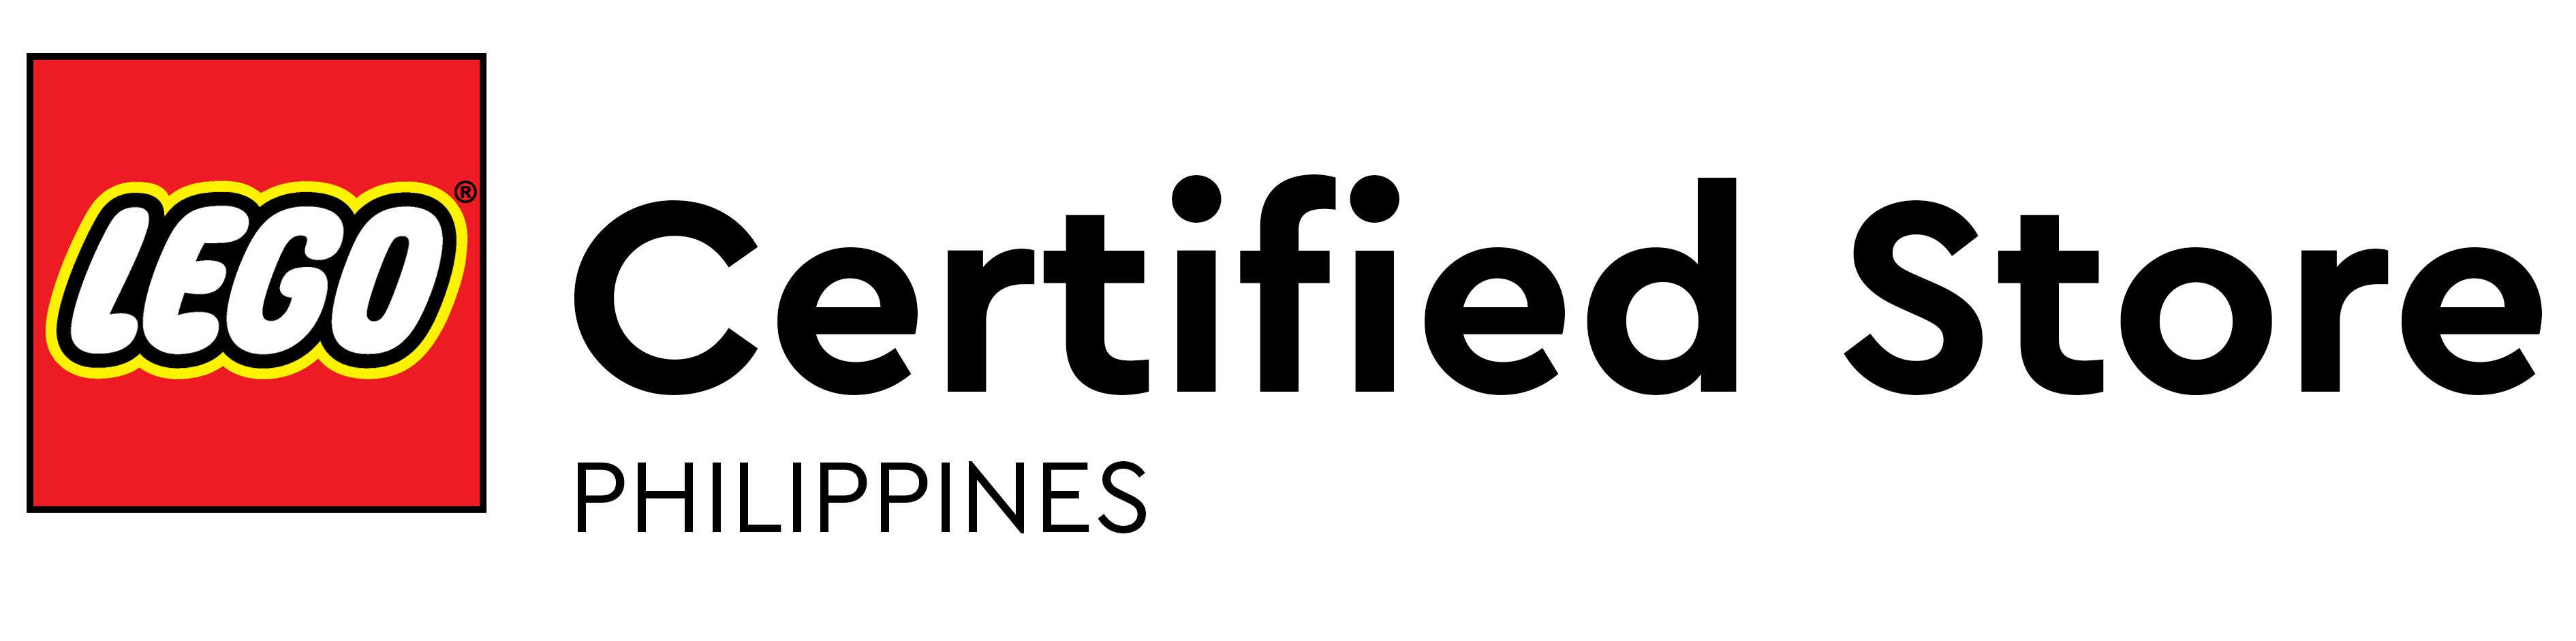 LEGO Certified Store (Ban Kee Bricks)